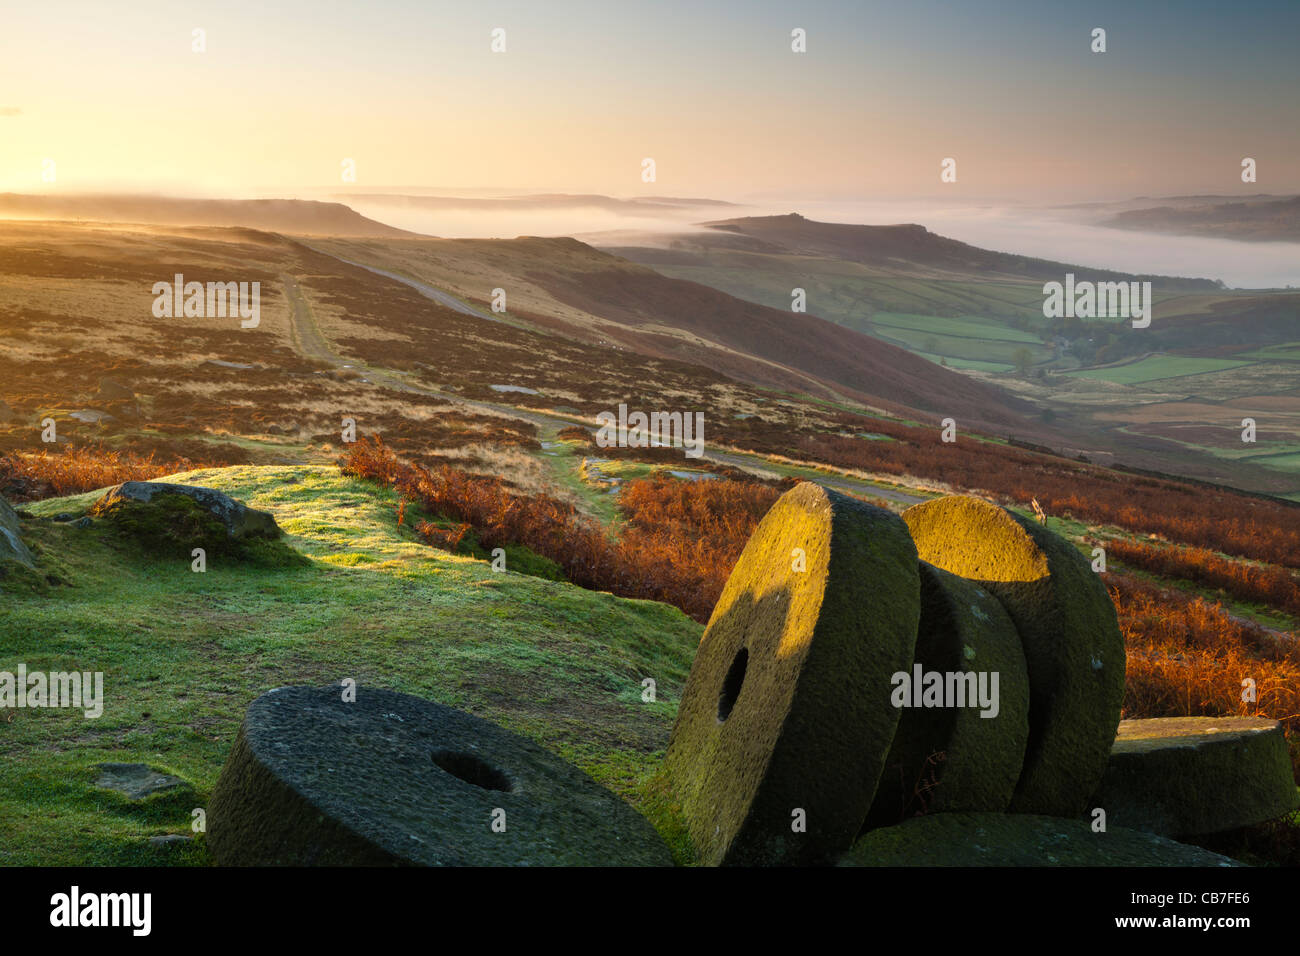 Sunrise, Stanage Edge millstones, Peak District National Park, Derbyshire, England, UK - Stock Image